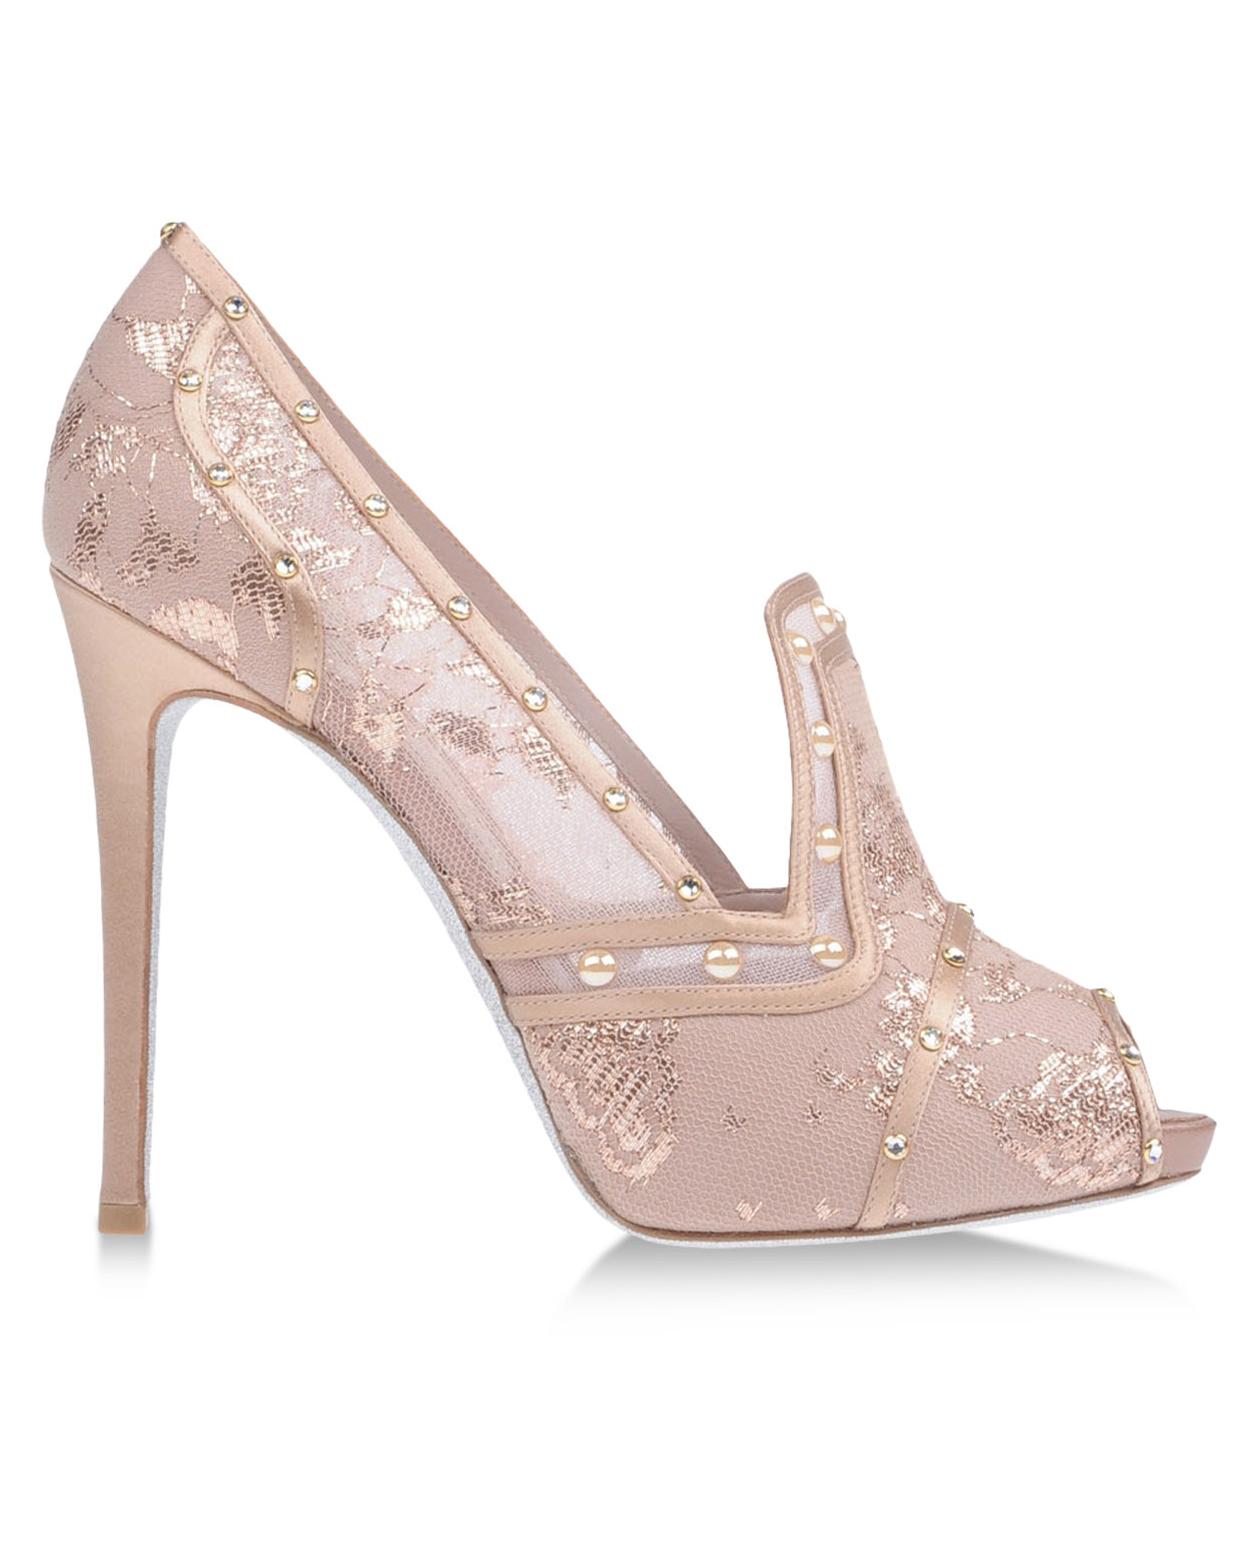 rene-caovilla-shoes-msw-fall13.jpg